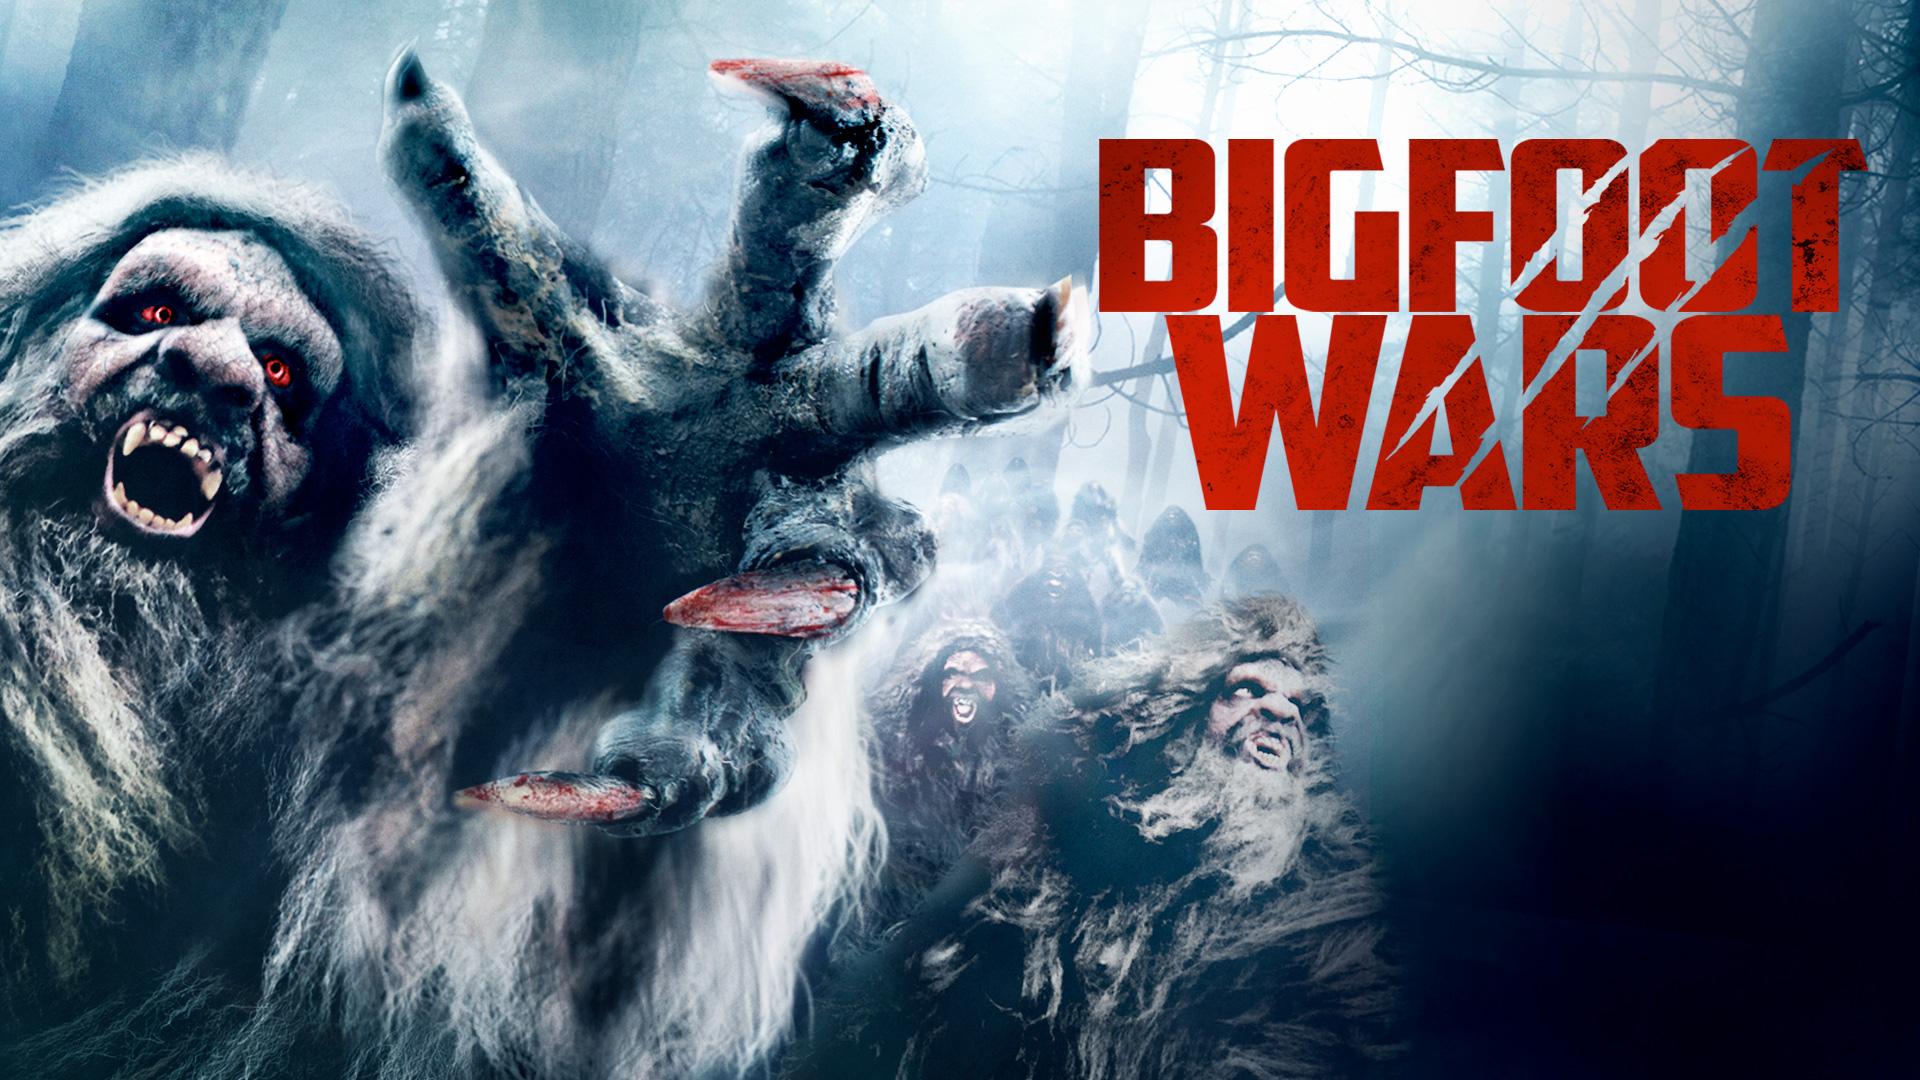 Bigfoot Wars